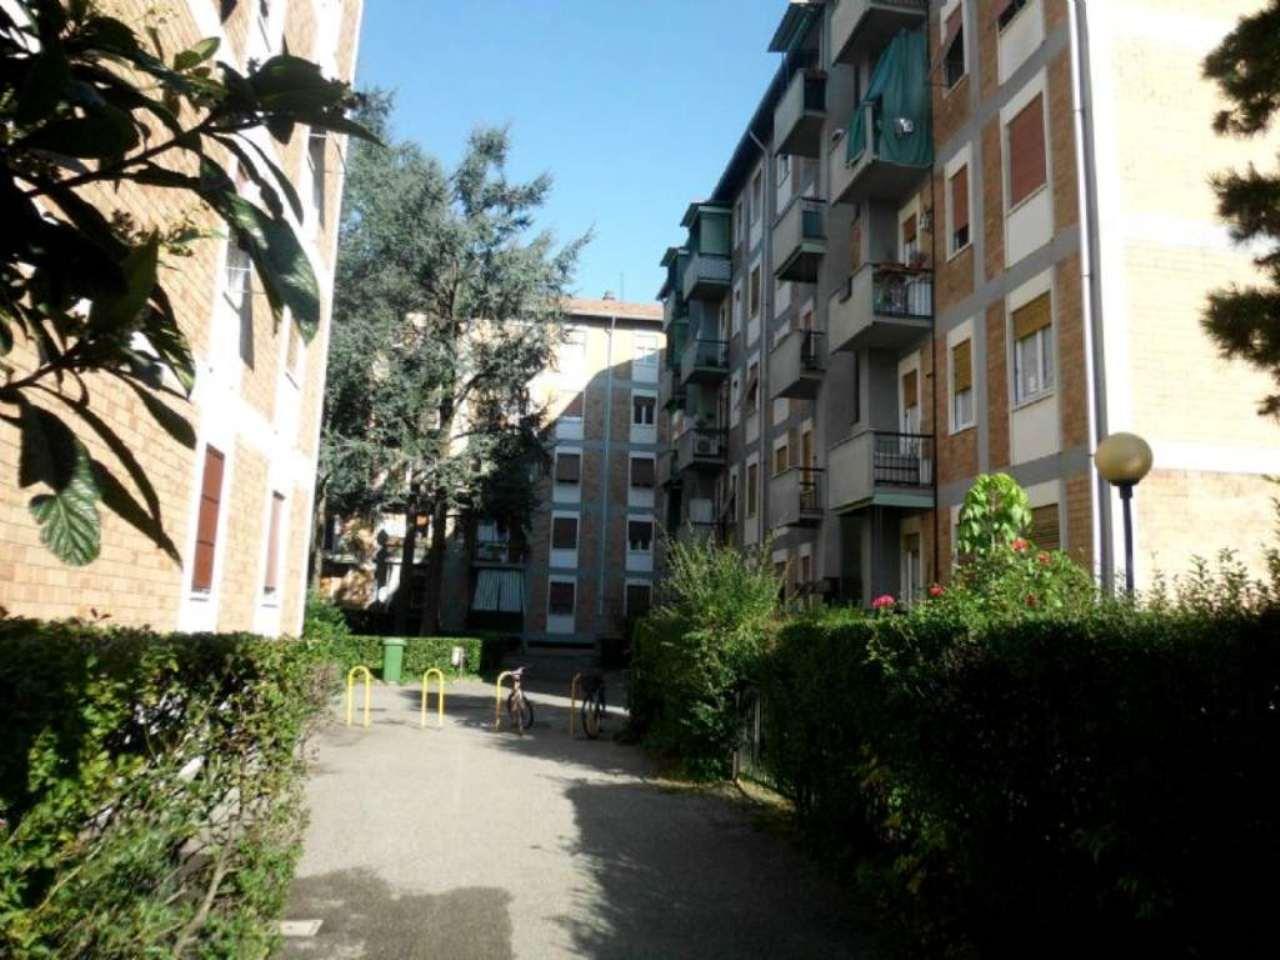 Bilocale Monza Via Pellegrini 12